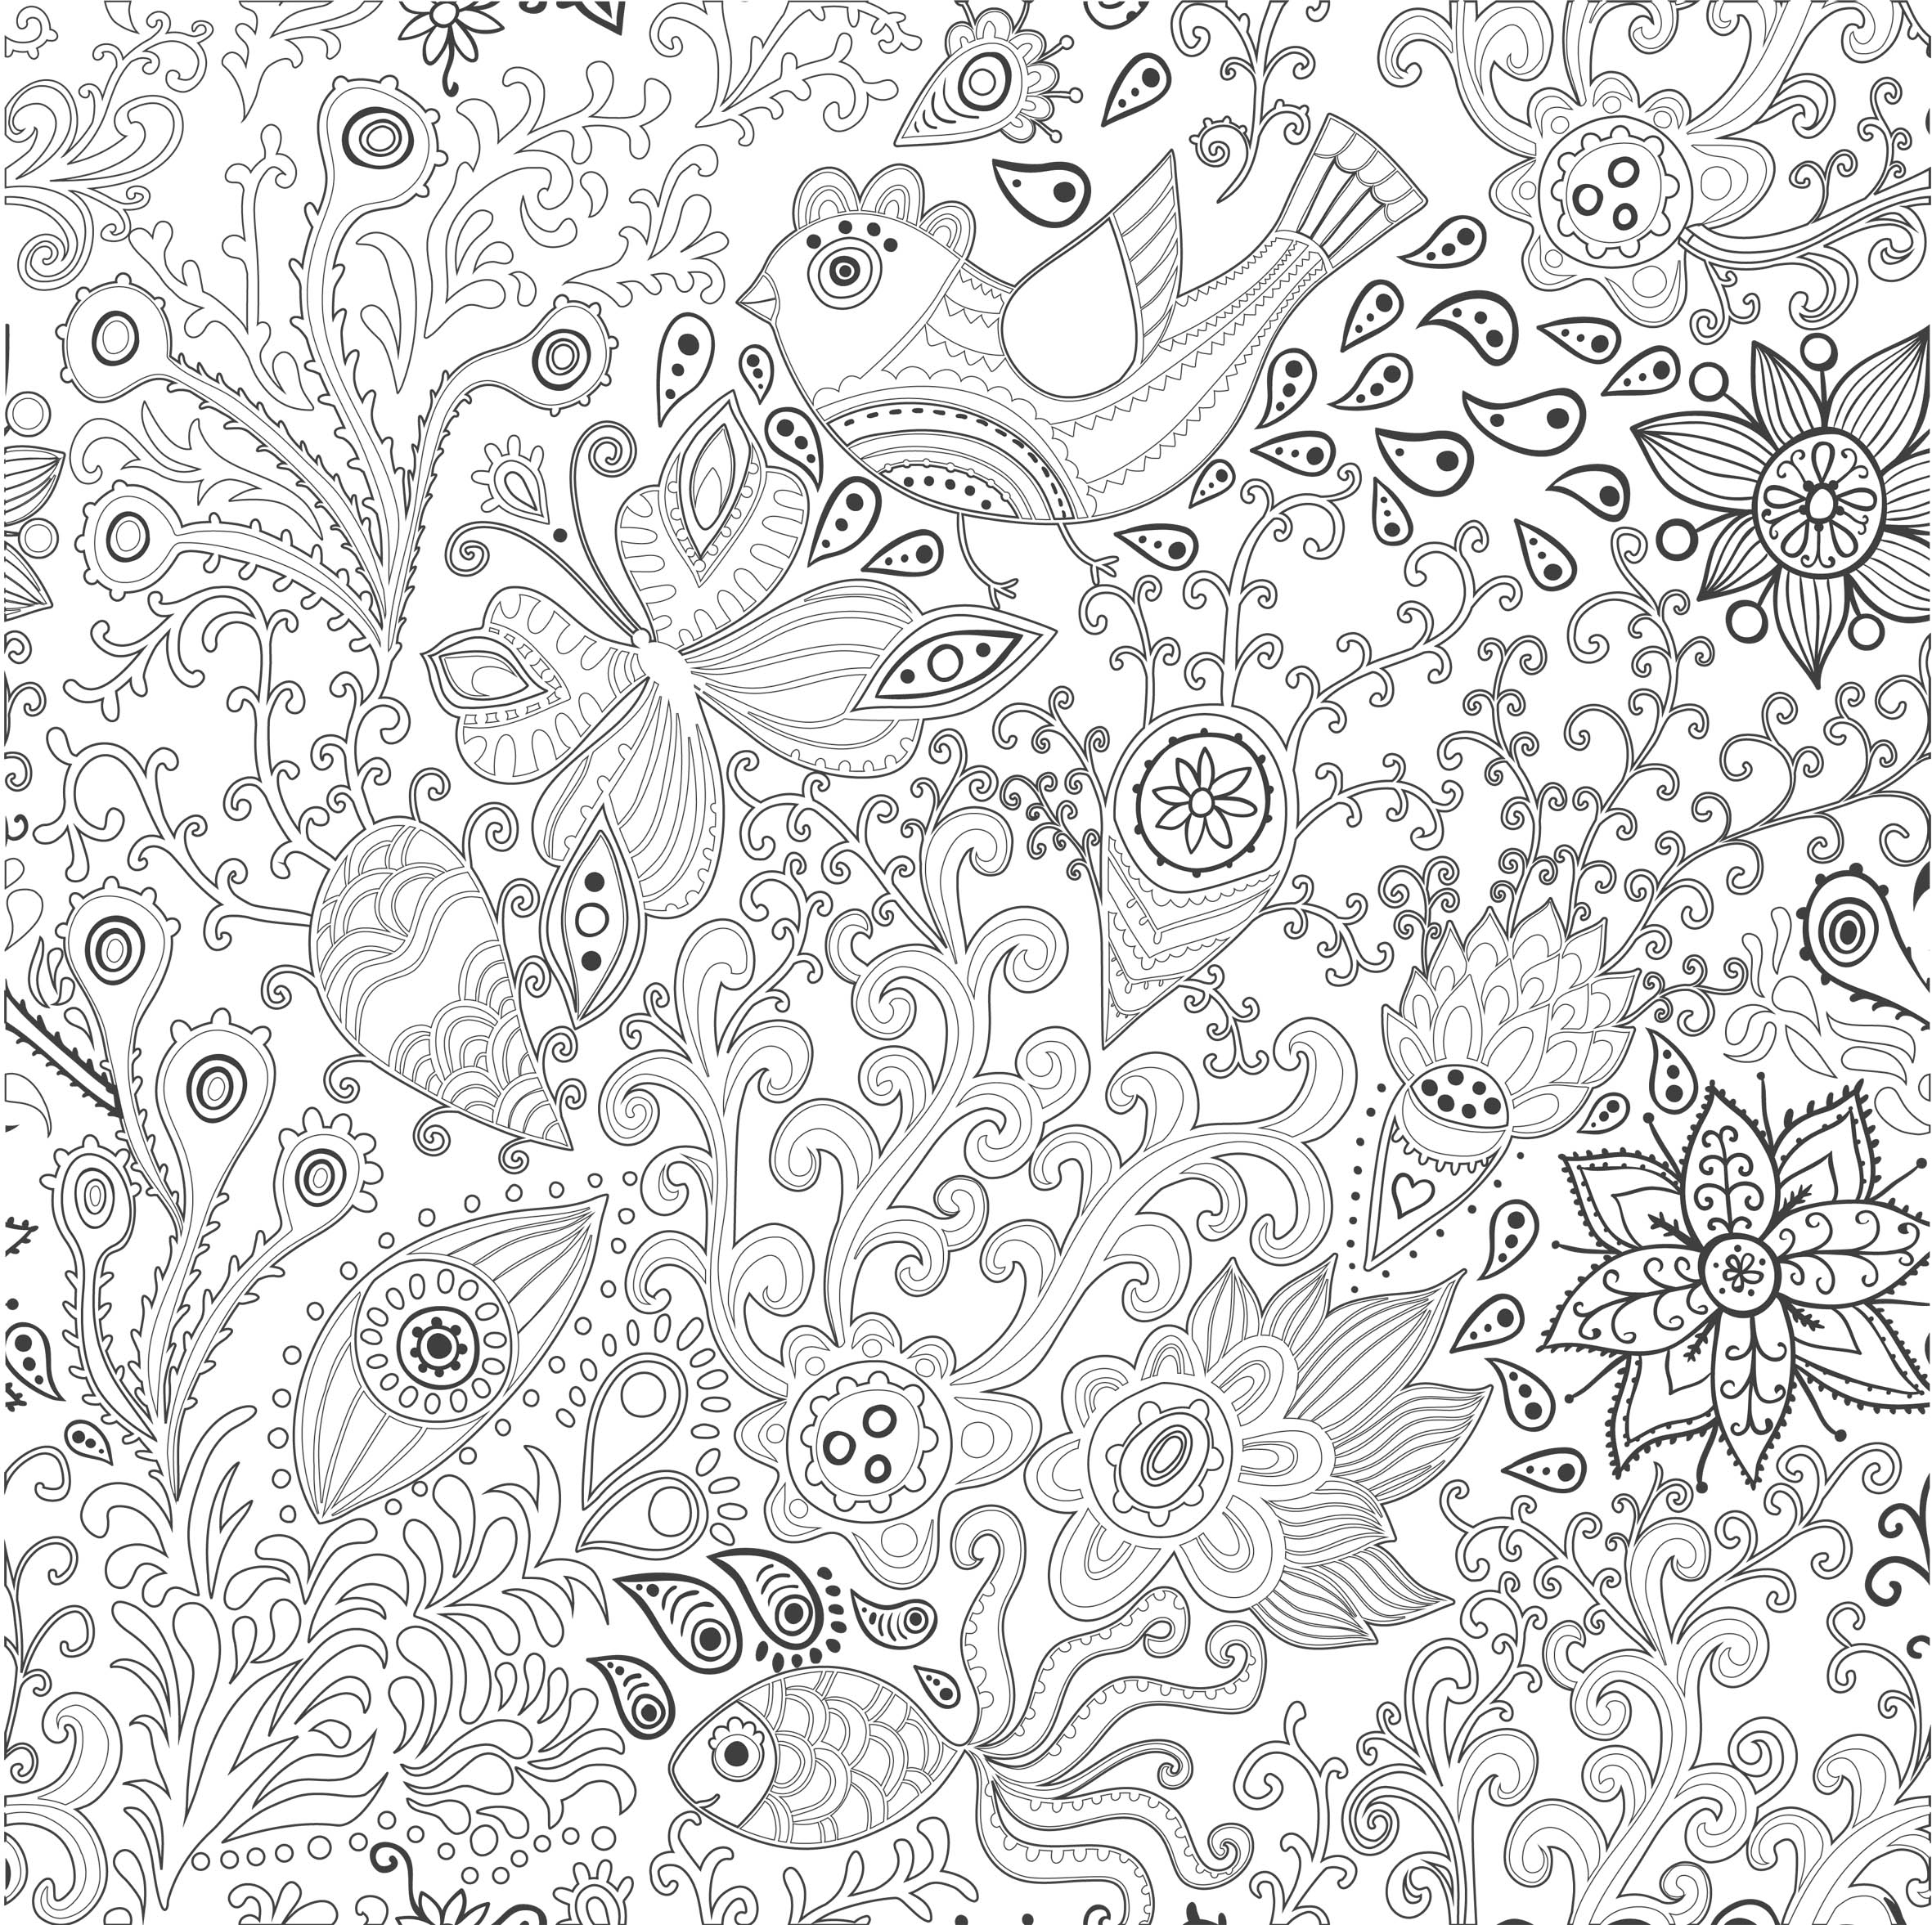 image 18864 coloriage anti stress gratuit